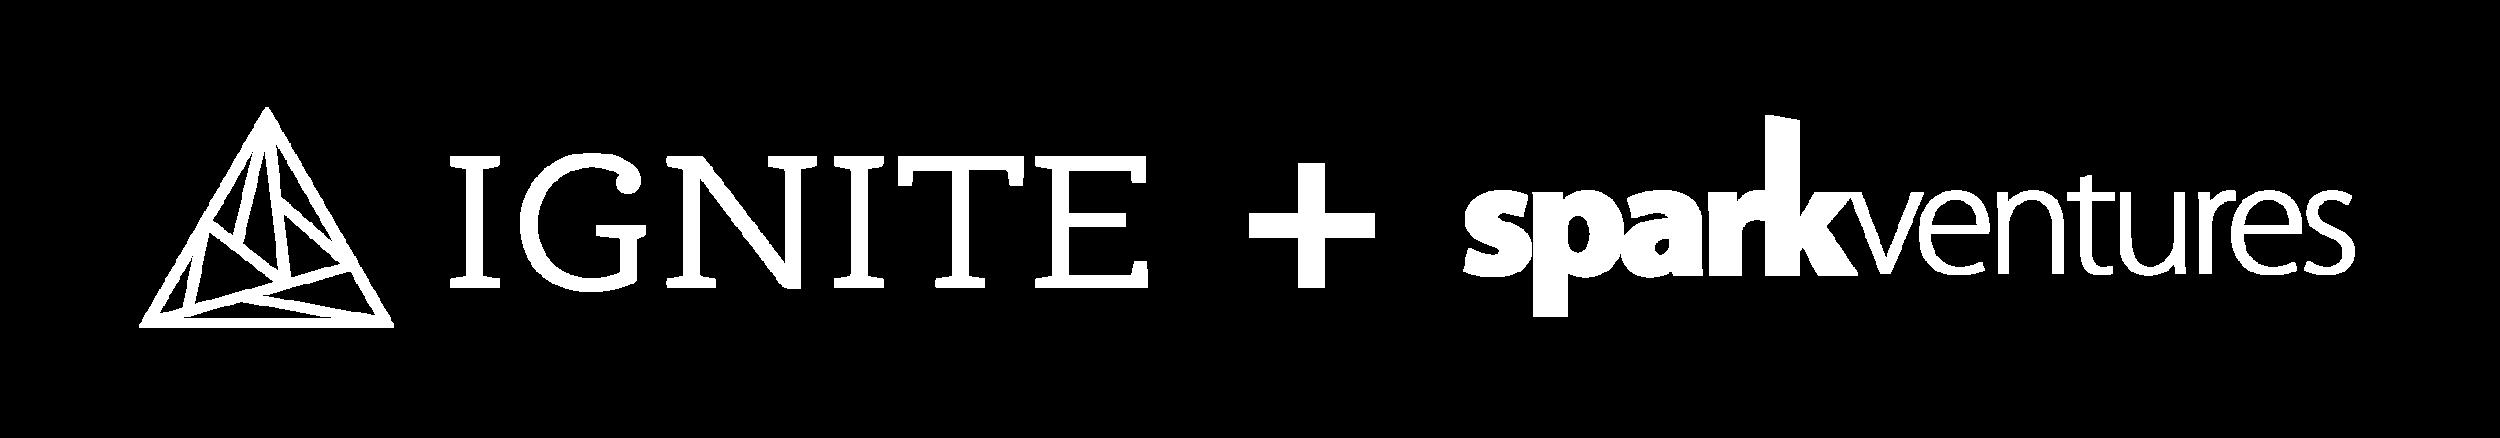 Spark + Ignite Logos-01.png